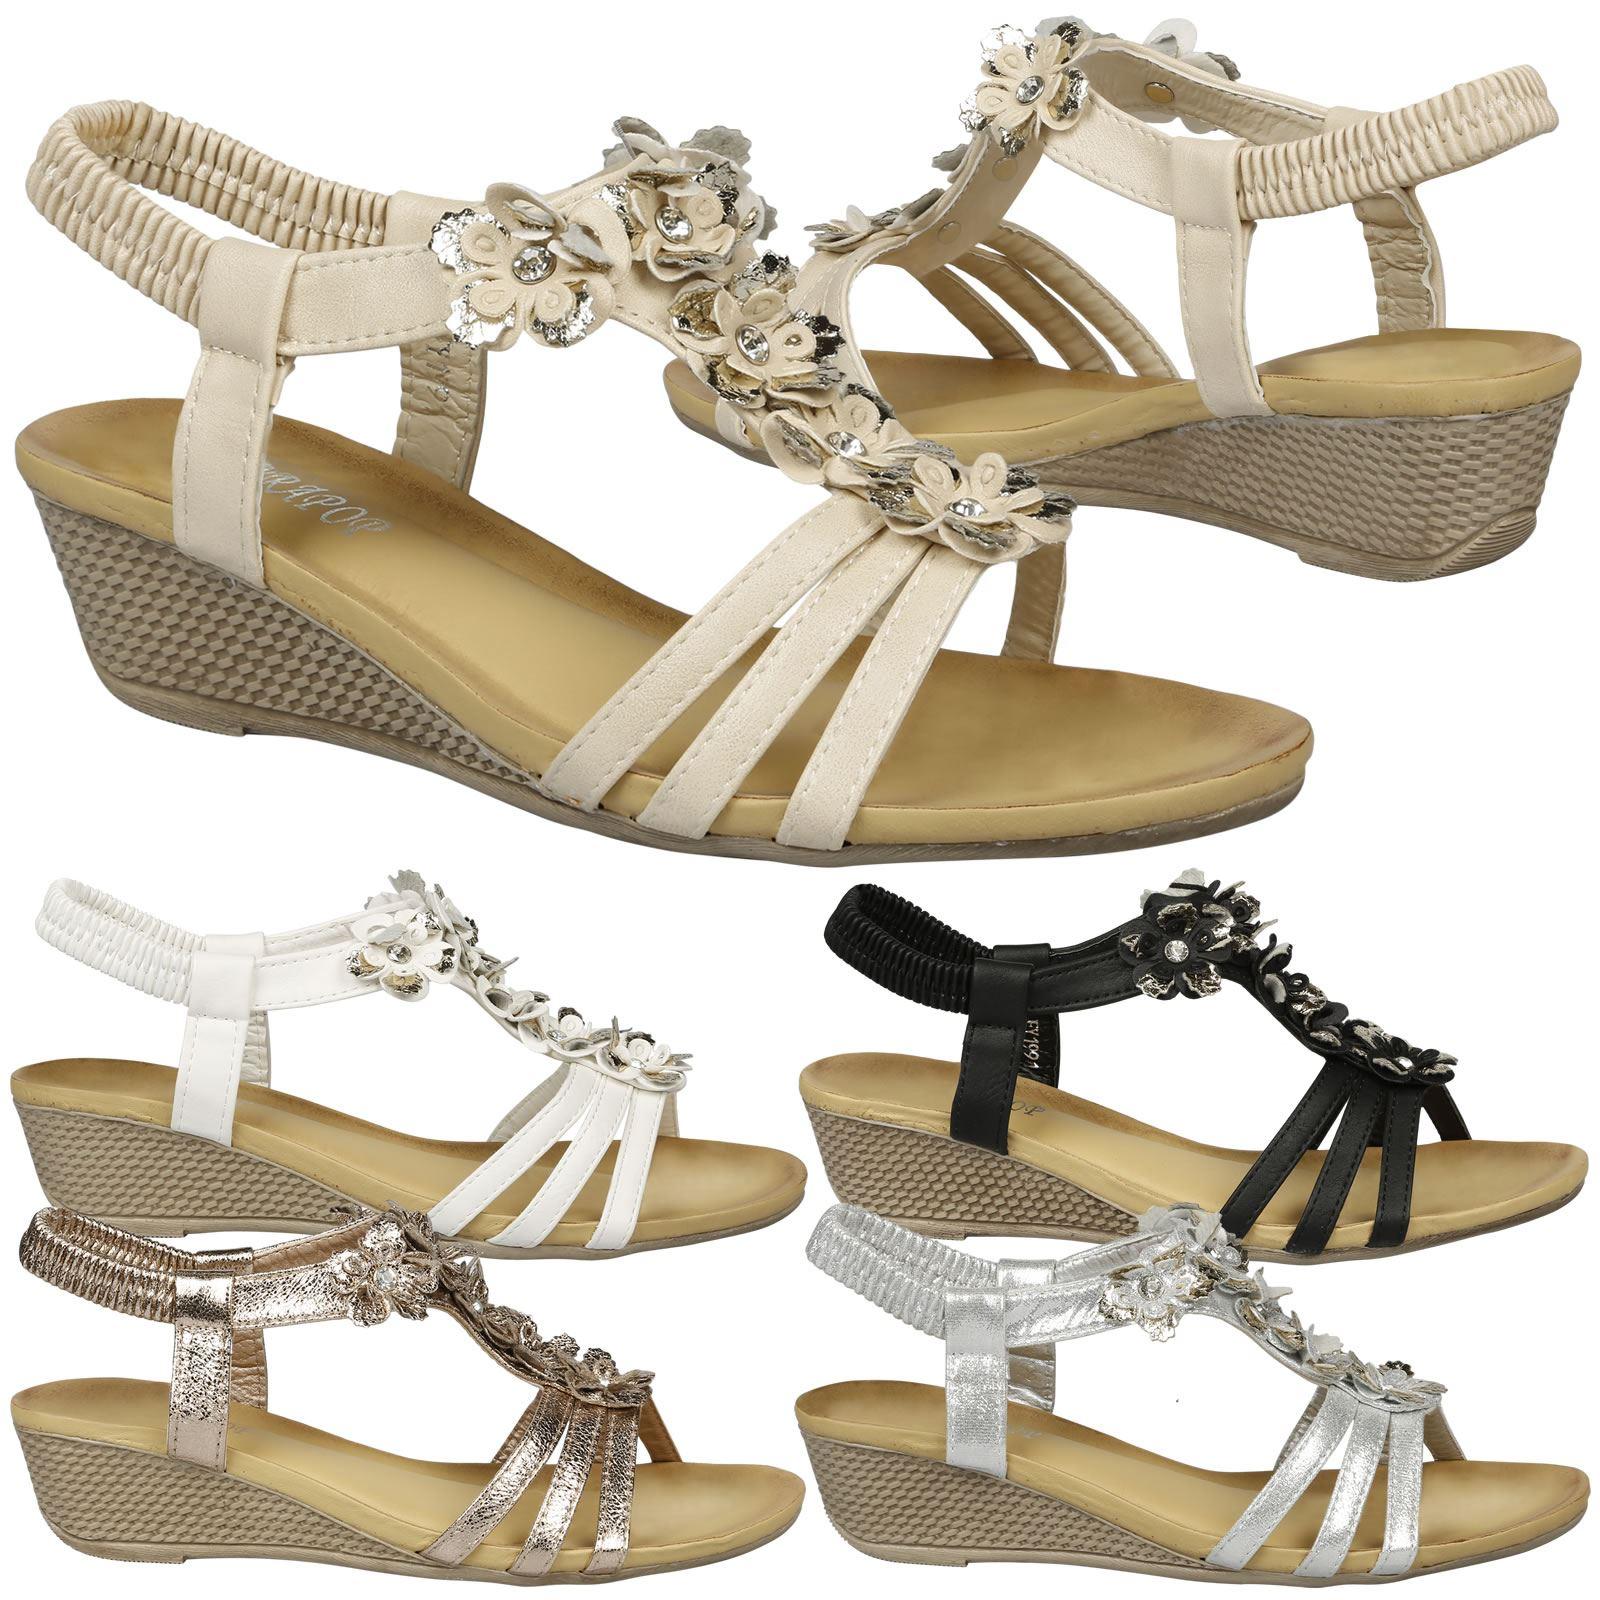 23c51aada Details about Leilani Womens Low Wedges Heels Floral T Bar Sandals Ladies  Open Toe Beach Shoes